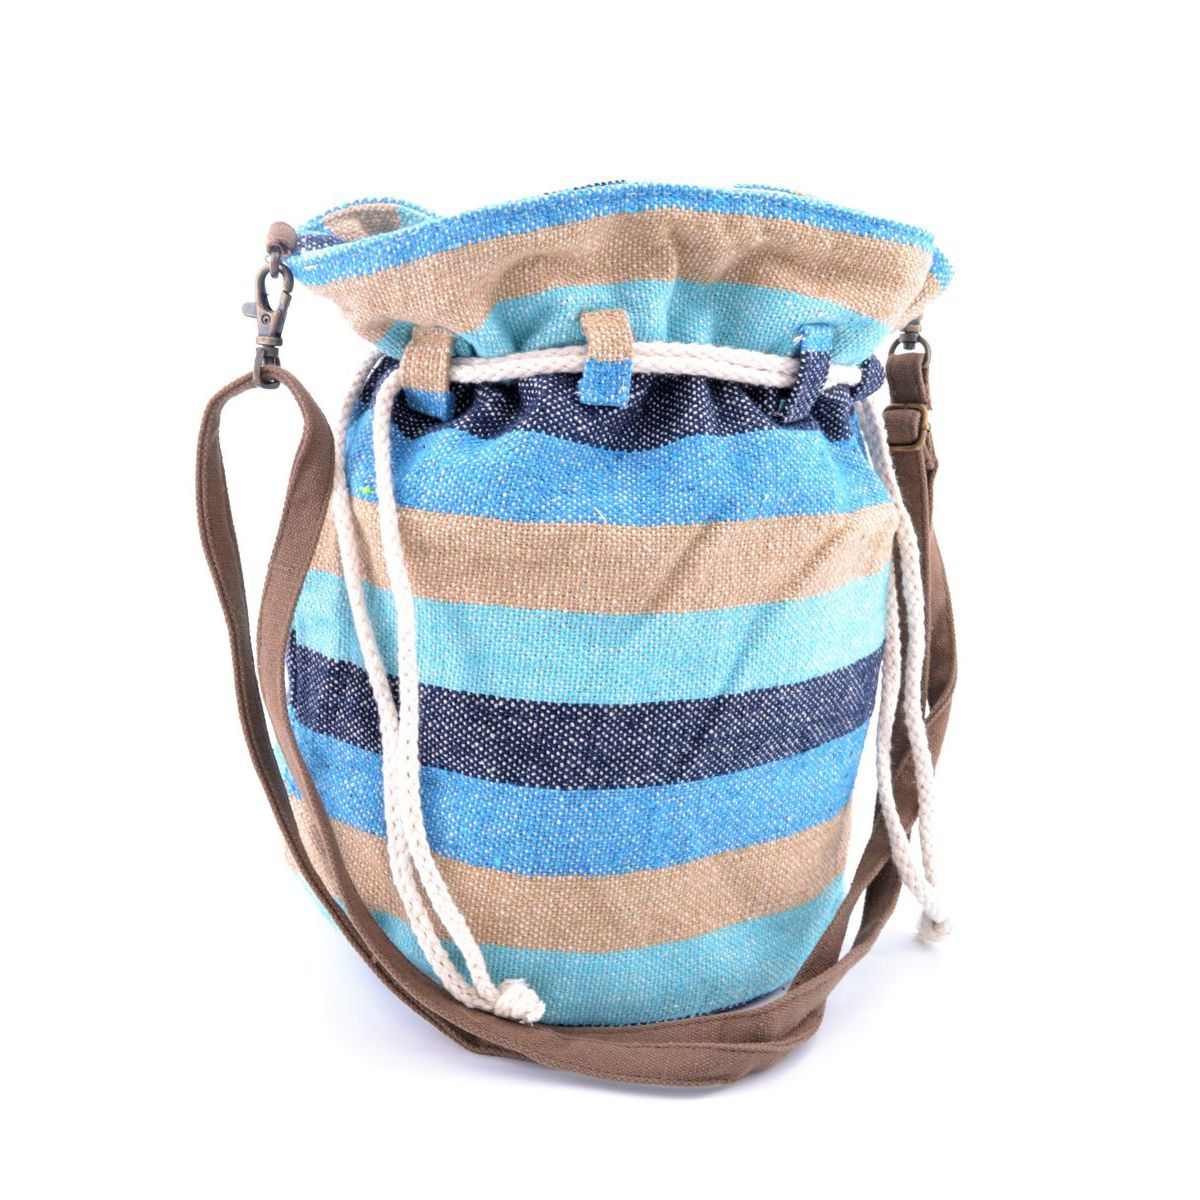 Cotton shoulder bag E19B204 Blue VestoPazzo